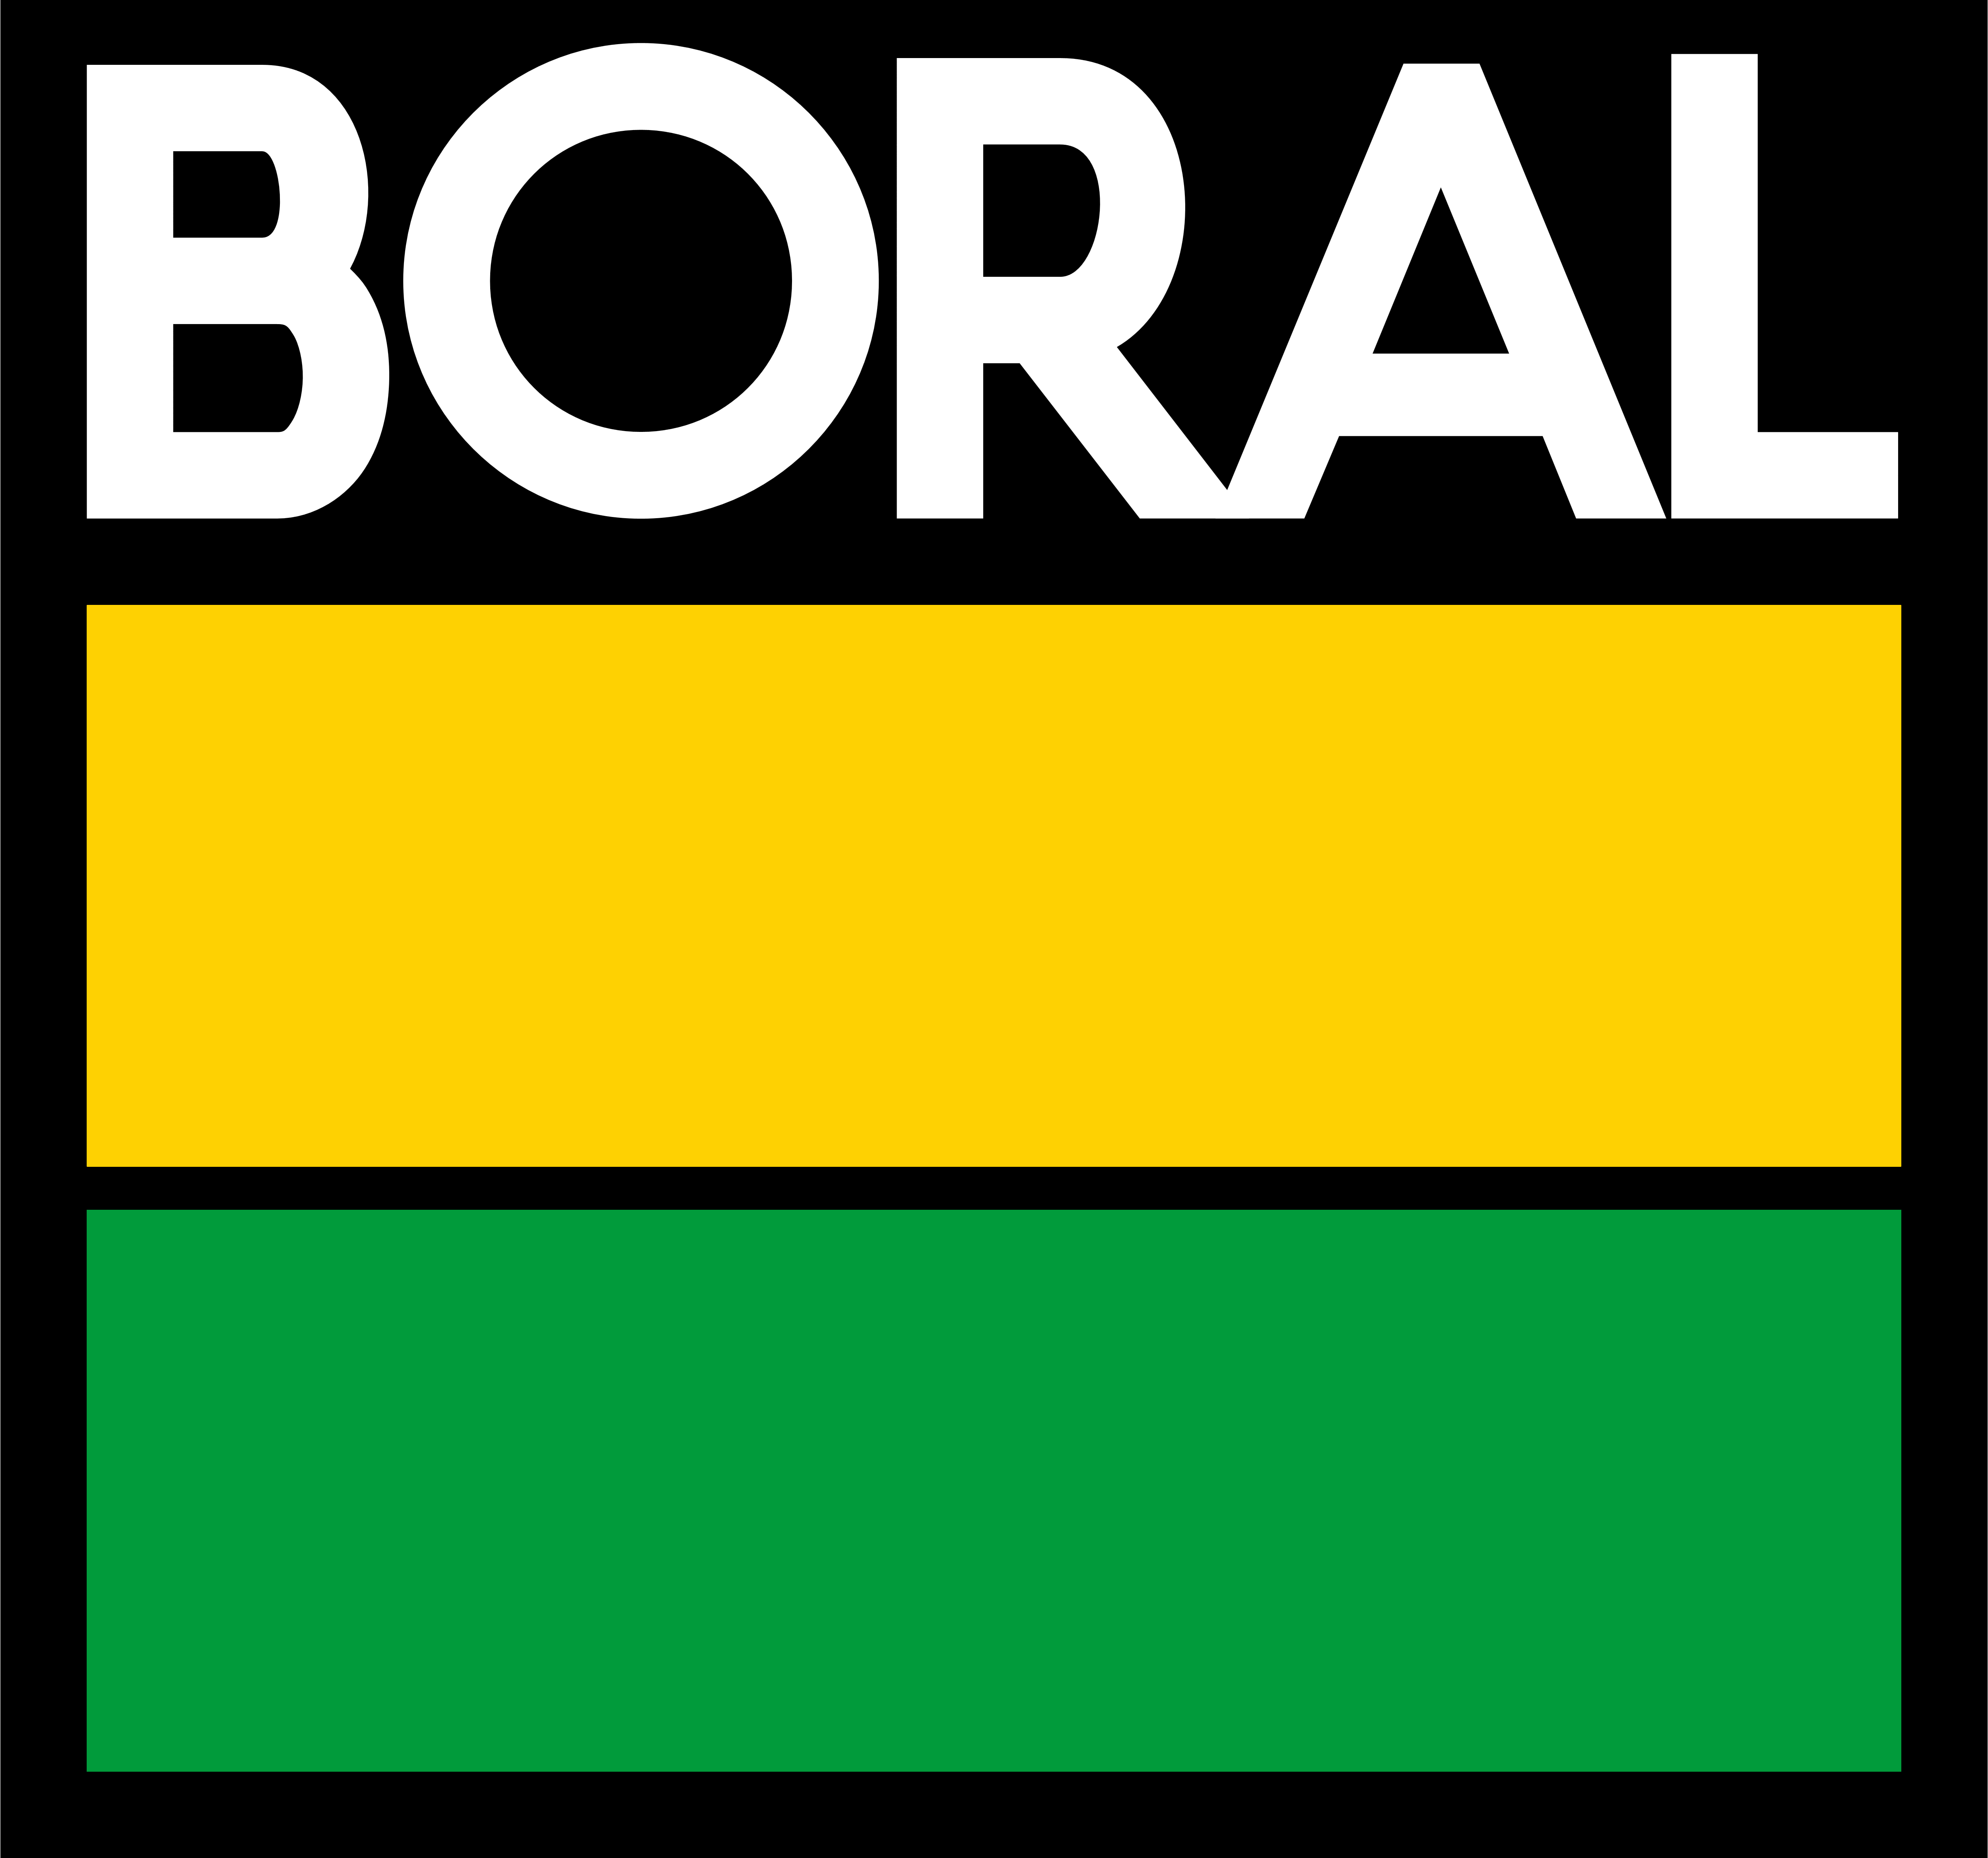 Boral Logos Download